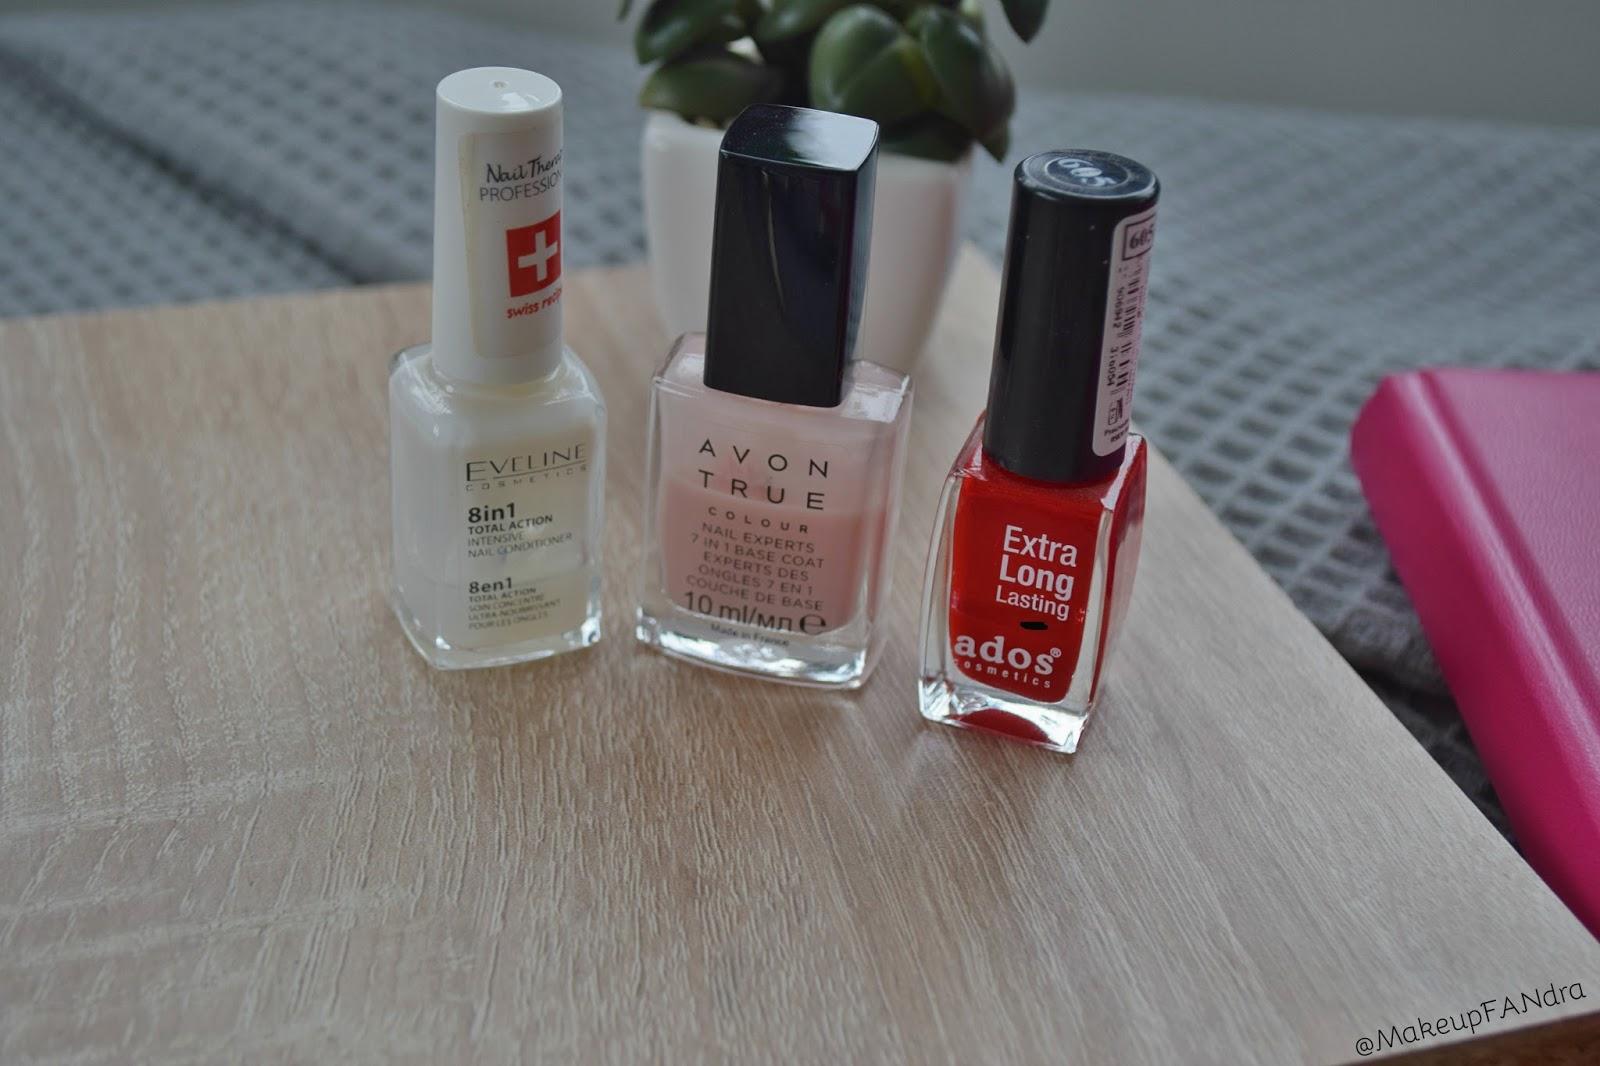 Eveline-Ados-Avon-nail-experts-7-u-1-bazni-lak-za-nokte